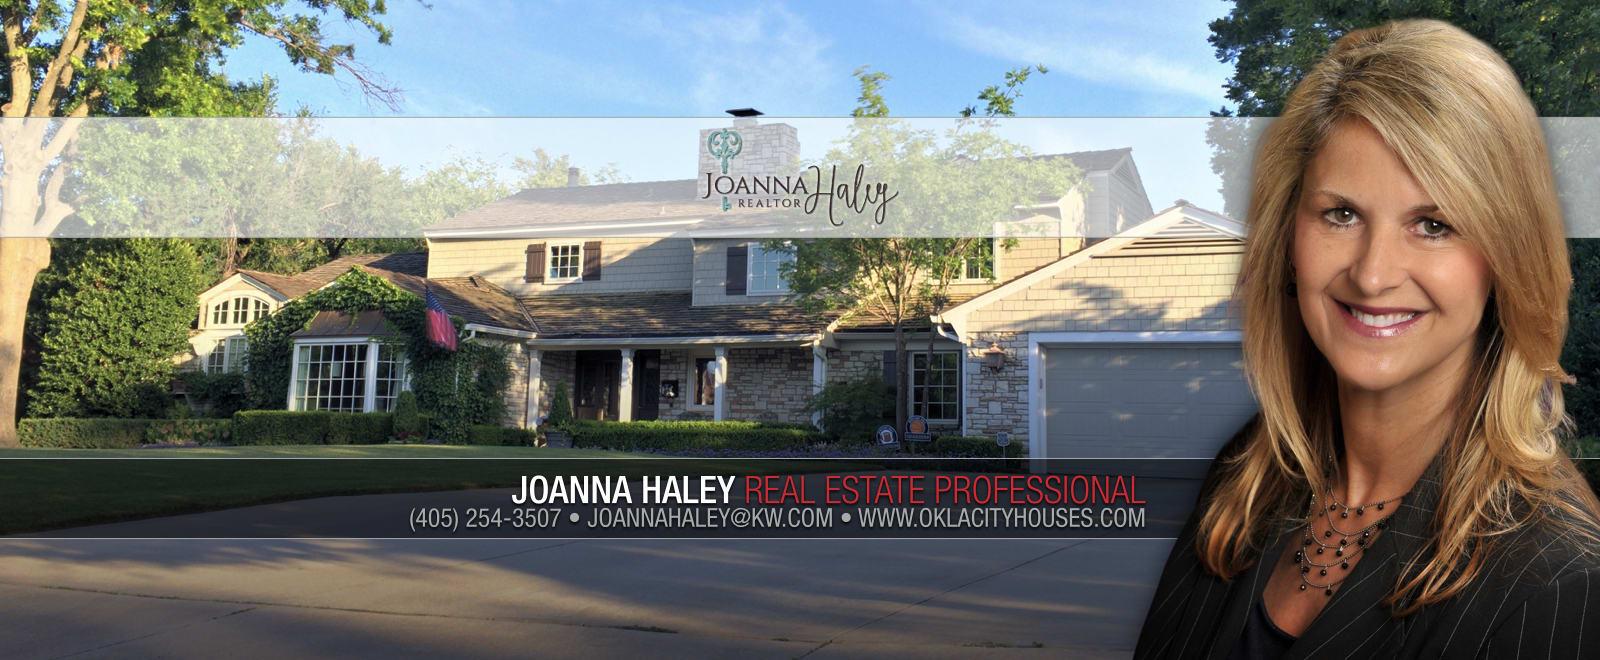 Auto Market Okc >> Contact Joanna - Joanna Haley, Real Estate Professional